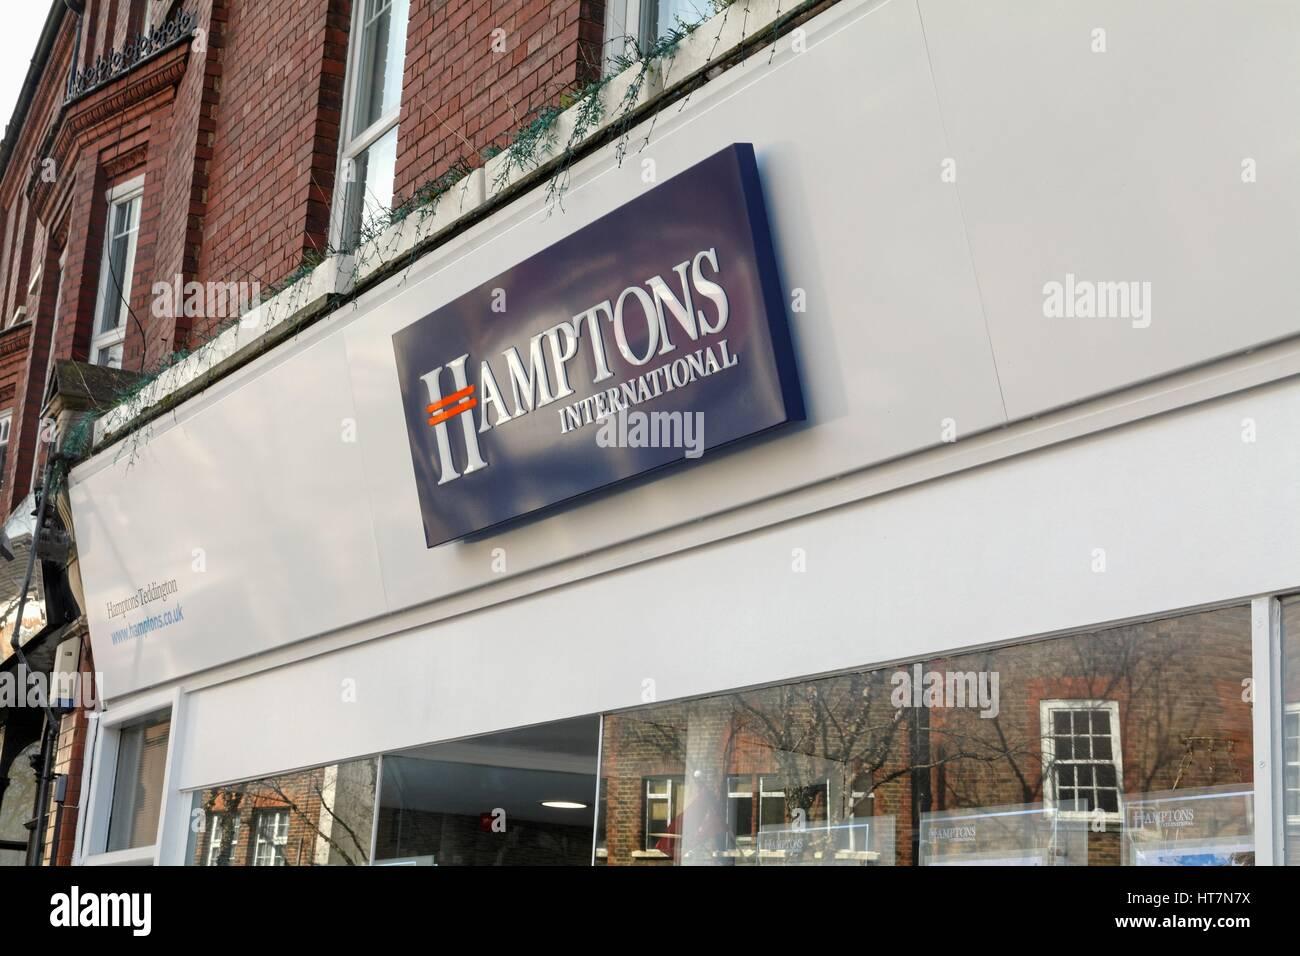 Exterior of Hamptons International estate agents in Teddington  west London UK - Stock Image